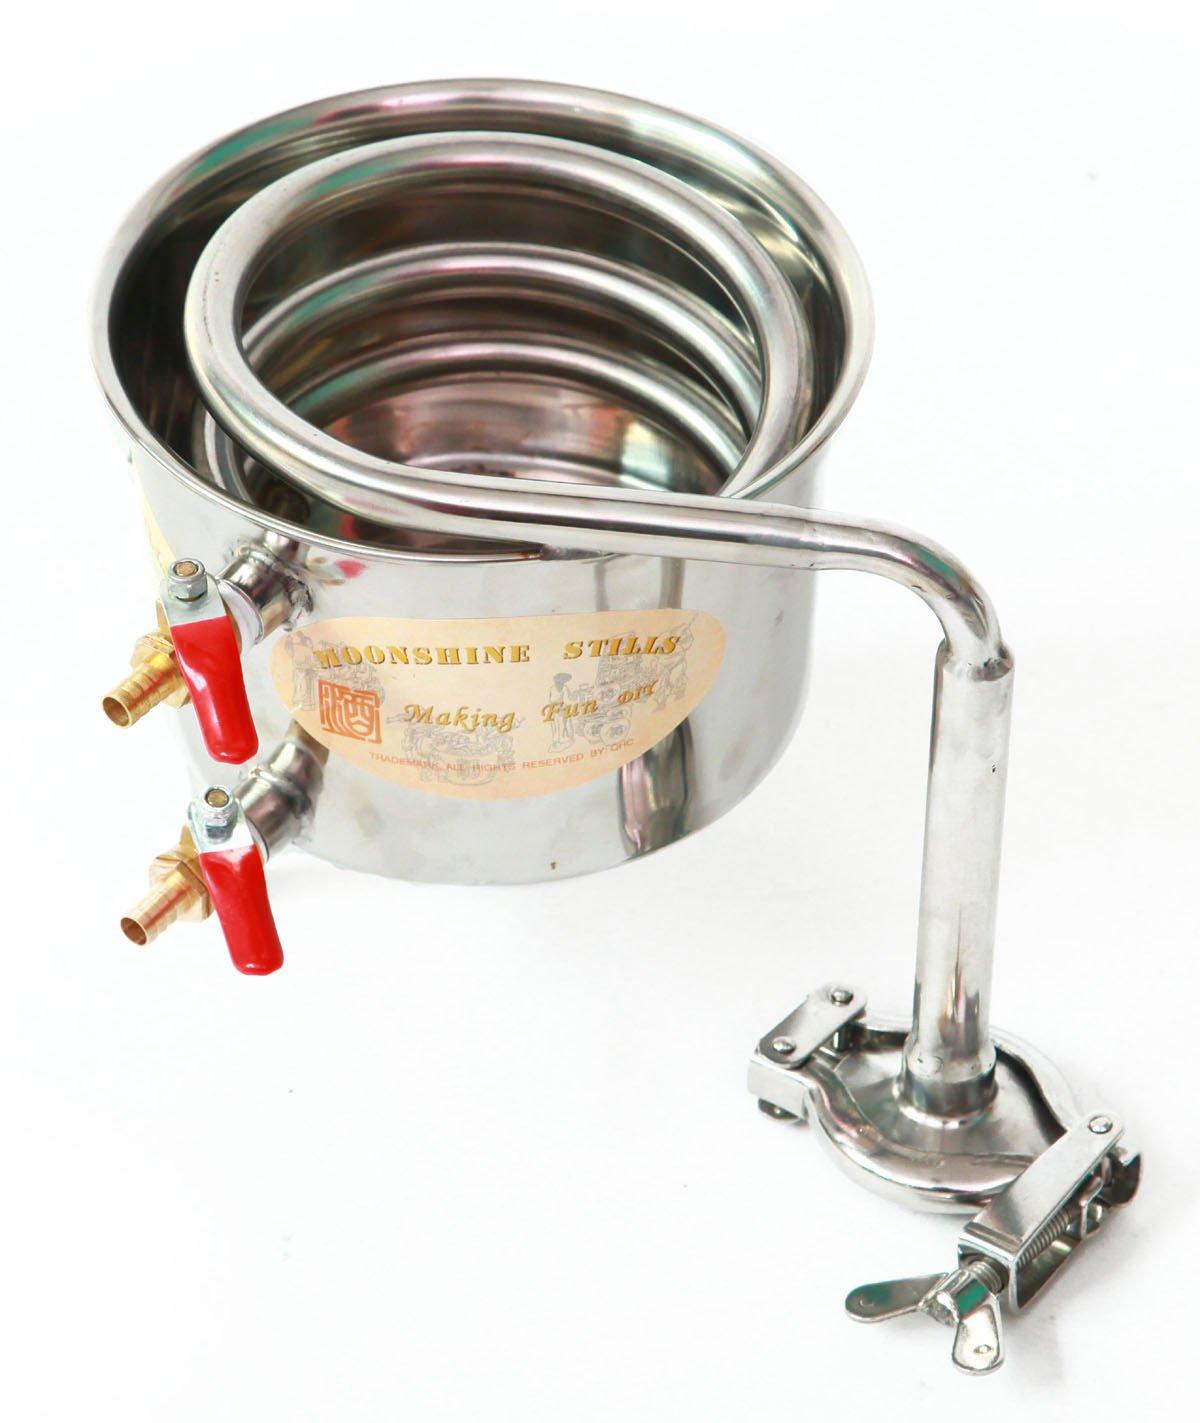 DIY 2 Gal 10 Liters Home Alcohol Whiskey Distiller Moonshine Still Stainless Steel Boiler Wine Making Kit by WMN_TRULYSTEP (Image #5)